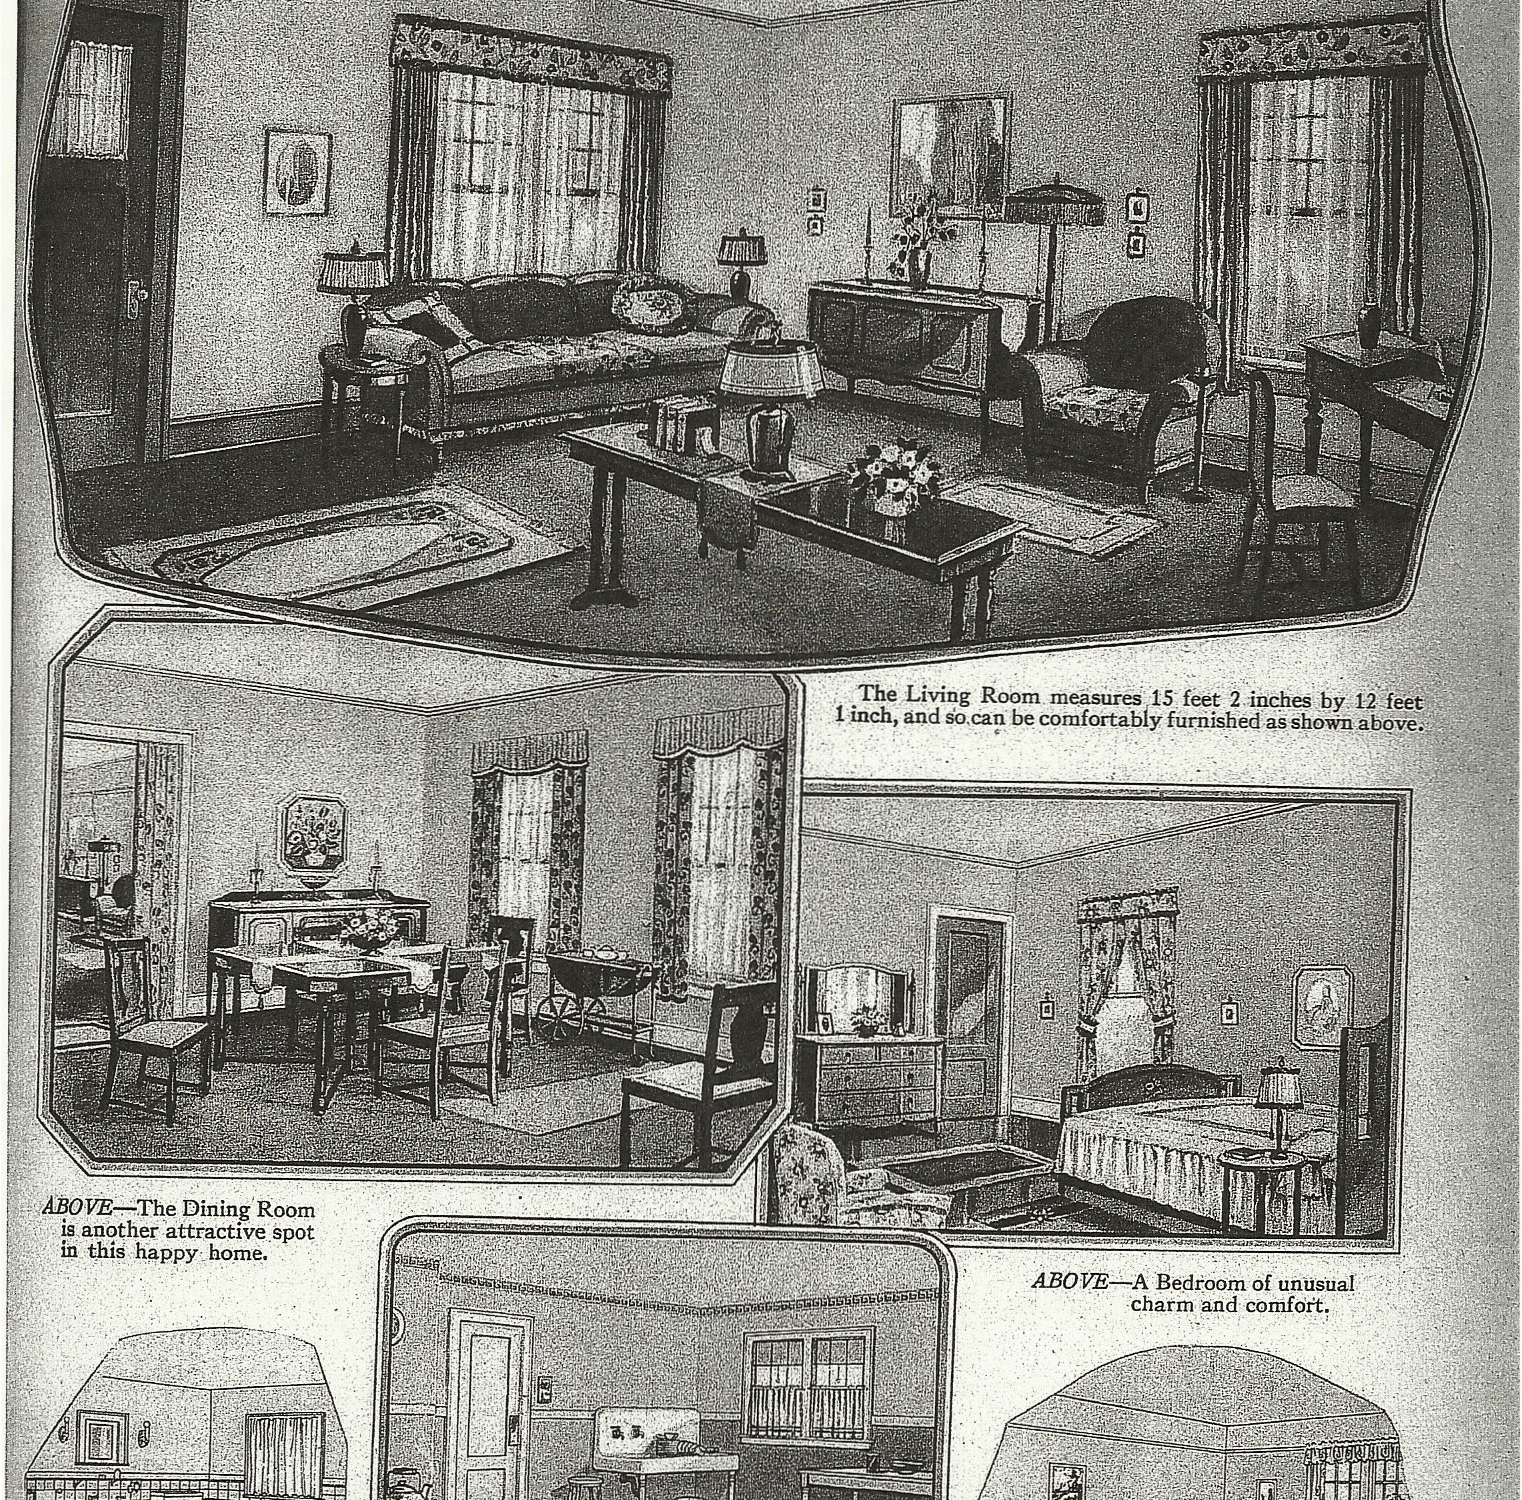 Sears Catalog house Interior